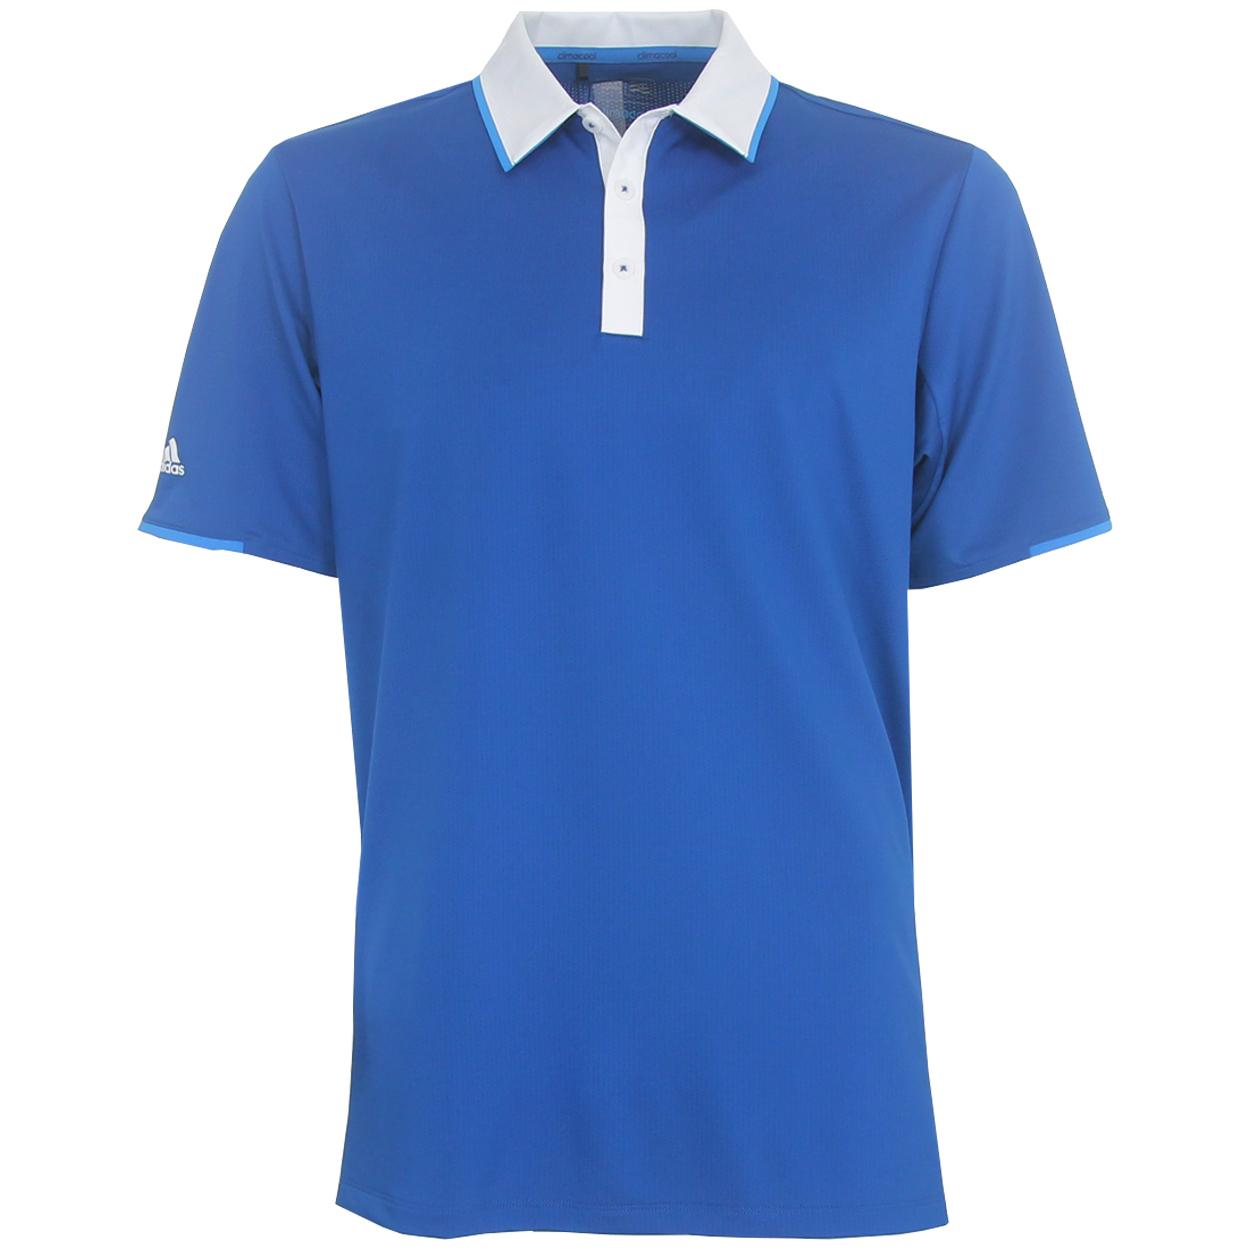 7c96b8aaa4 Adidas ClimaCool Tipped Polo Shirt - GolfEtail.com